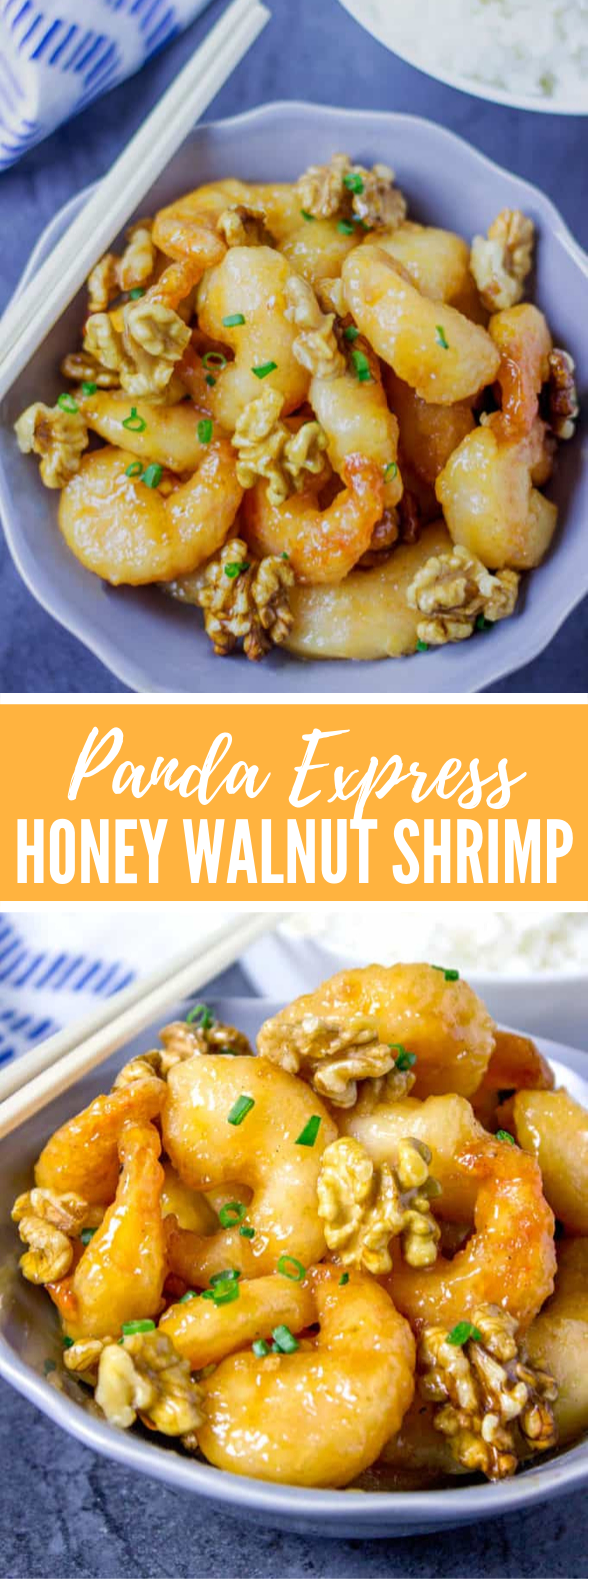 Panda Express Honey Walnut Shrimp #dinner #comfortfood